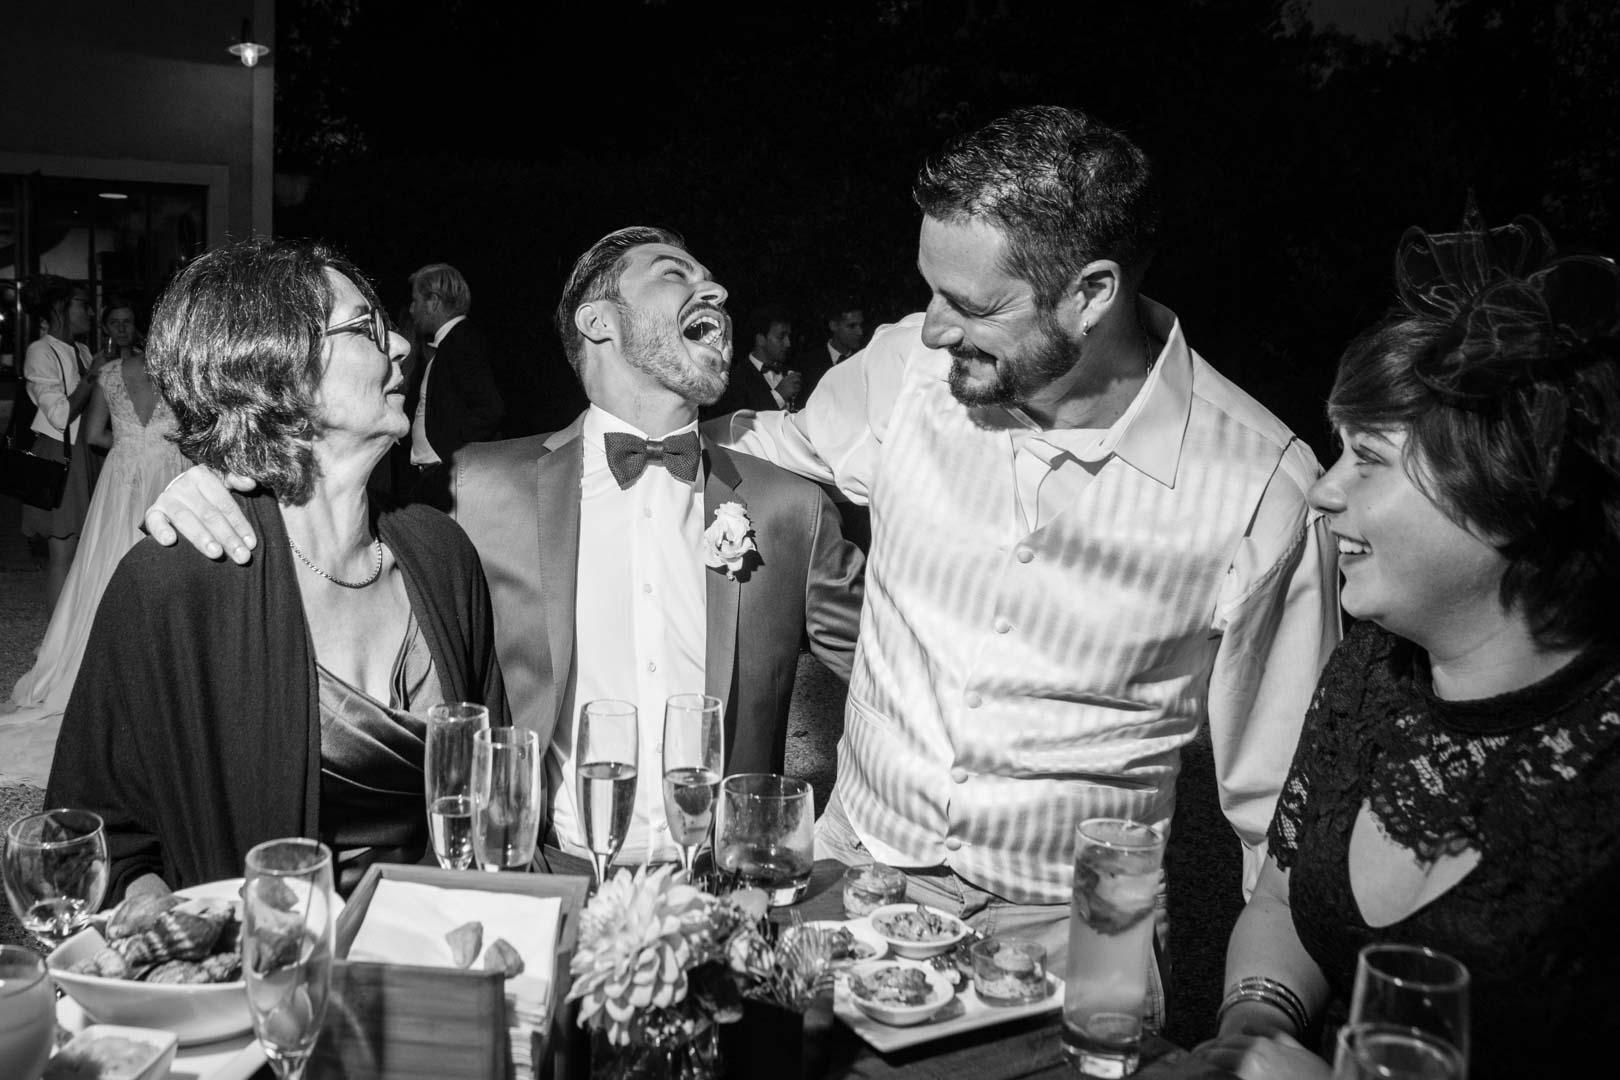 diner-mariage-chateau-quincampoix-1